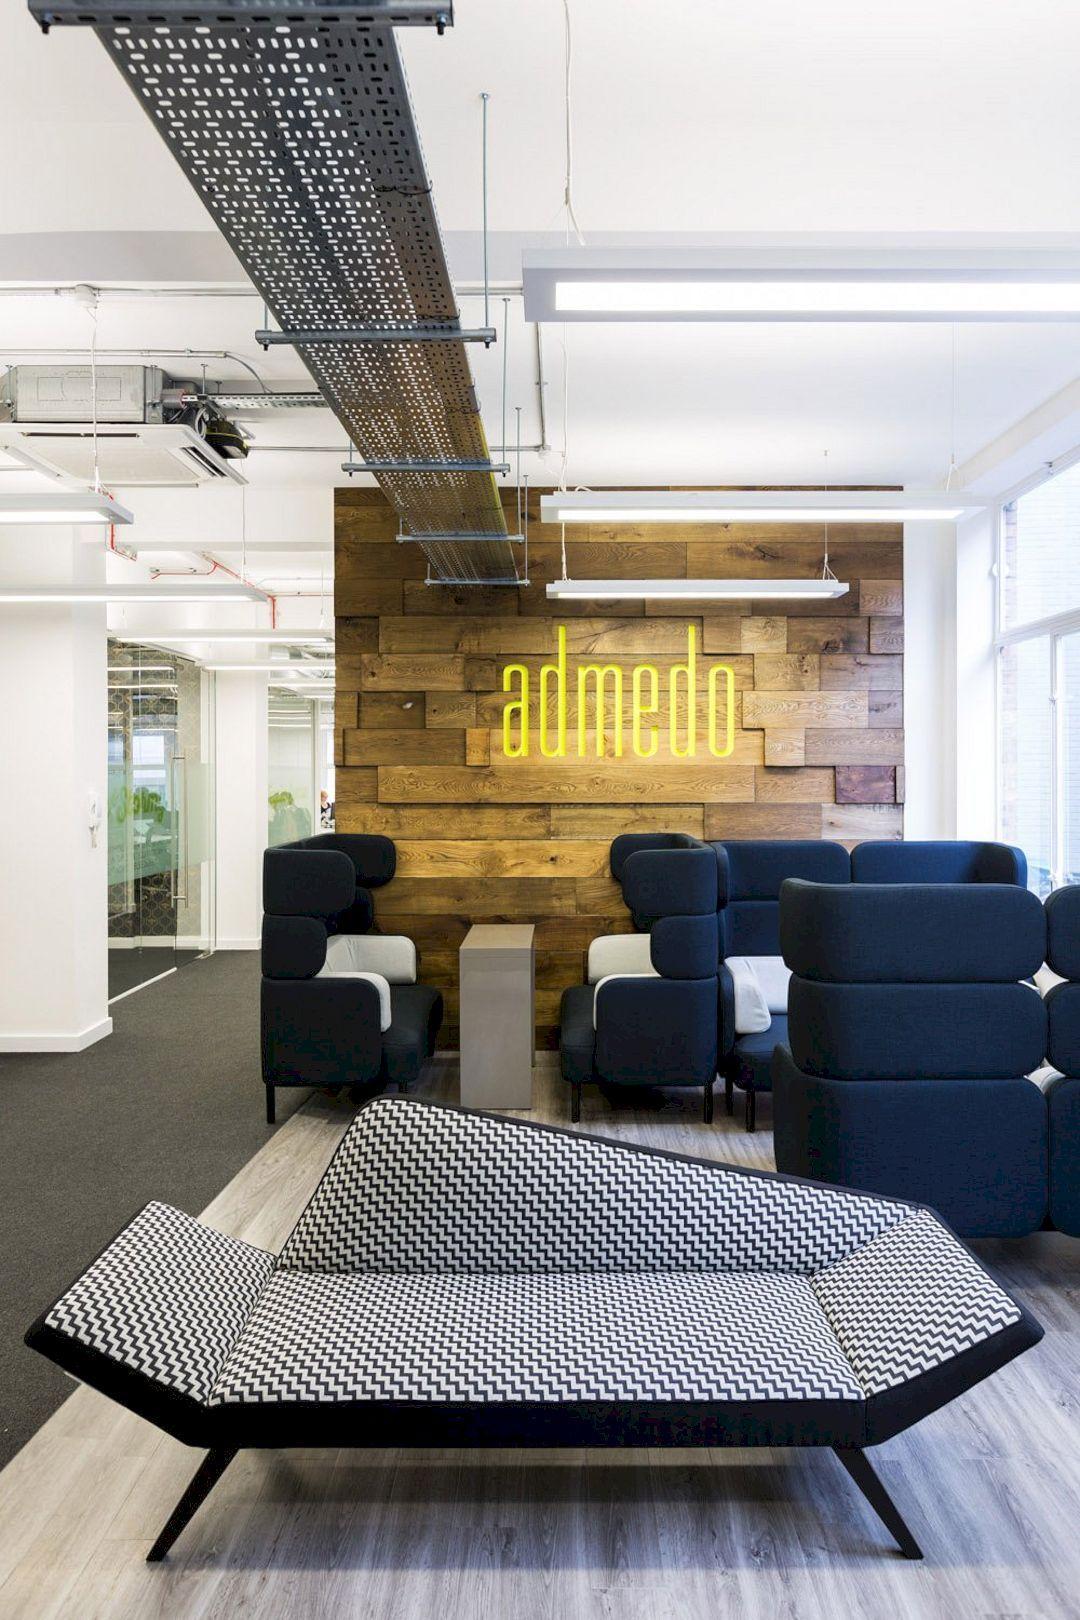 Merveilleux Best Modern And Gorgeous Office Interior Design Ideas  Https://www.futuristarchitecture.com/23070 Office Interior.html